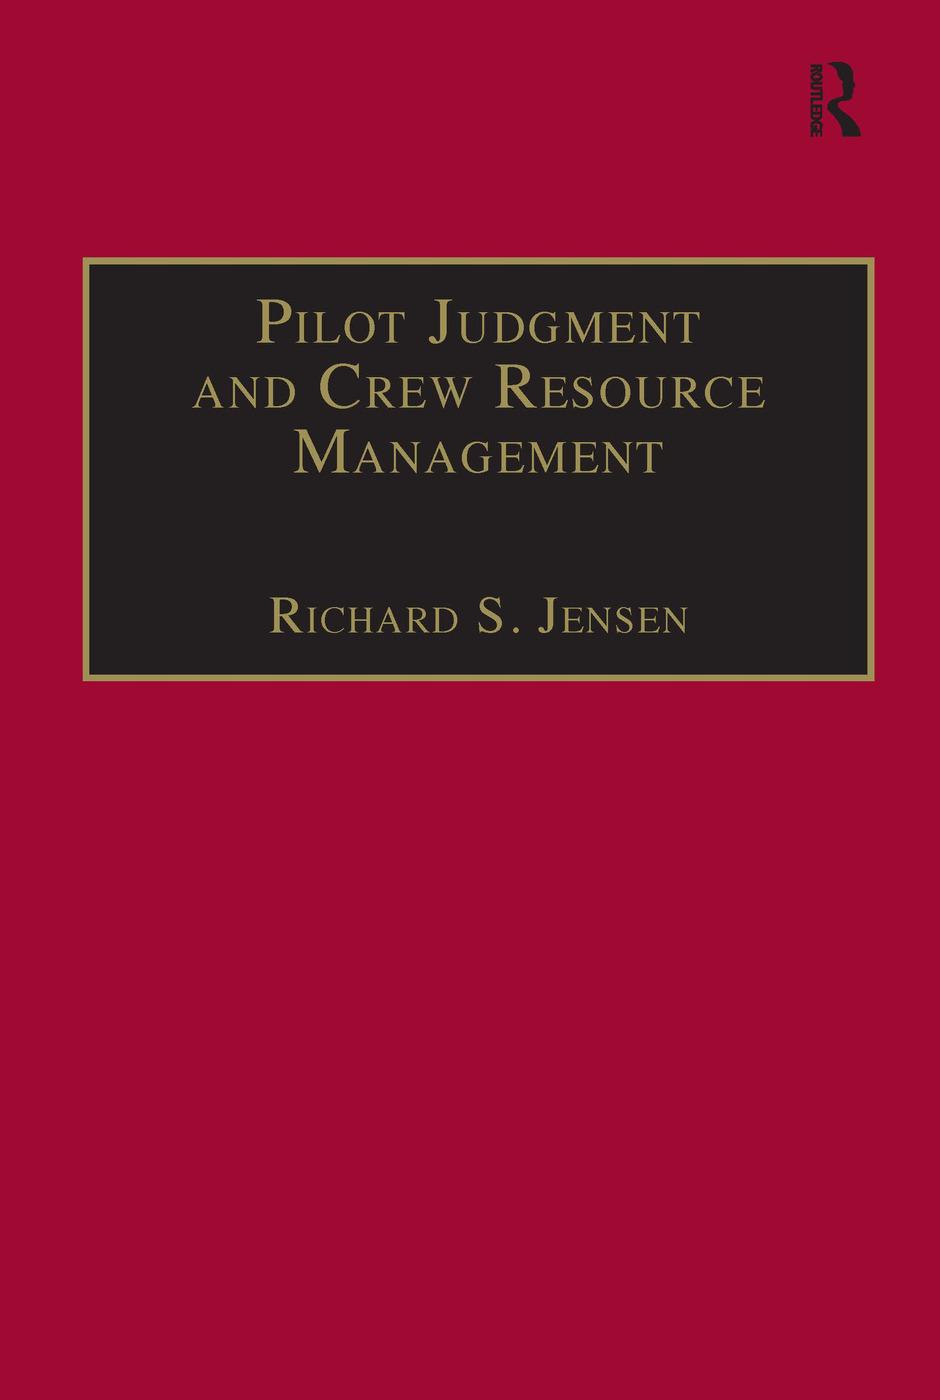 Management factors in pilot judgment